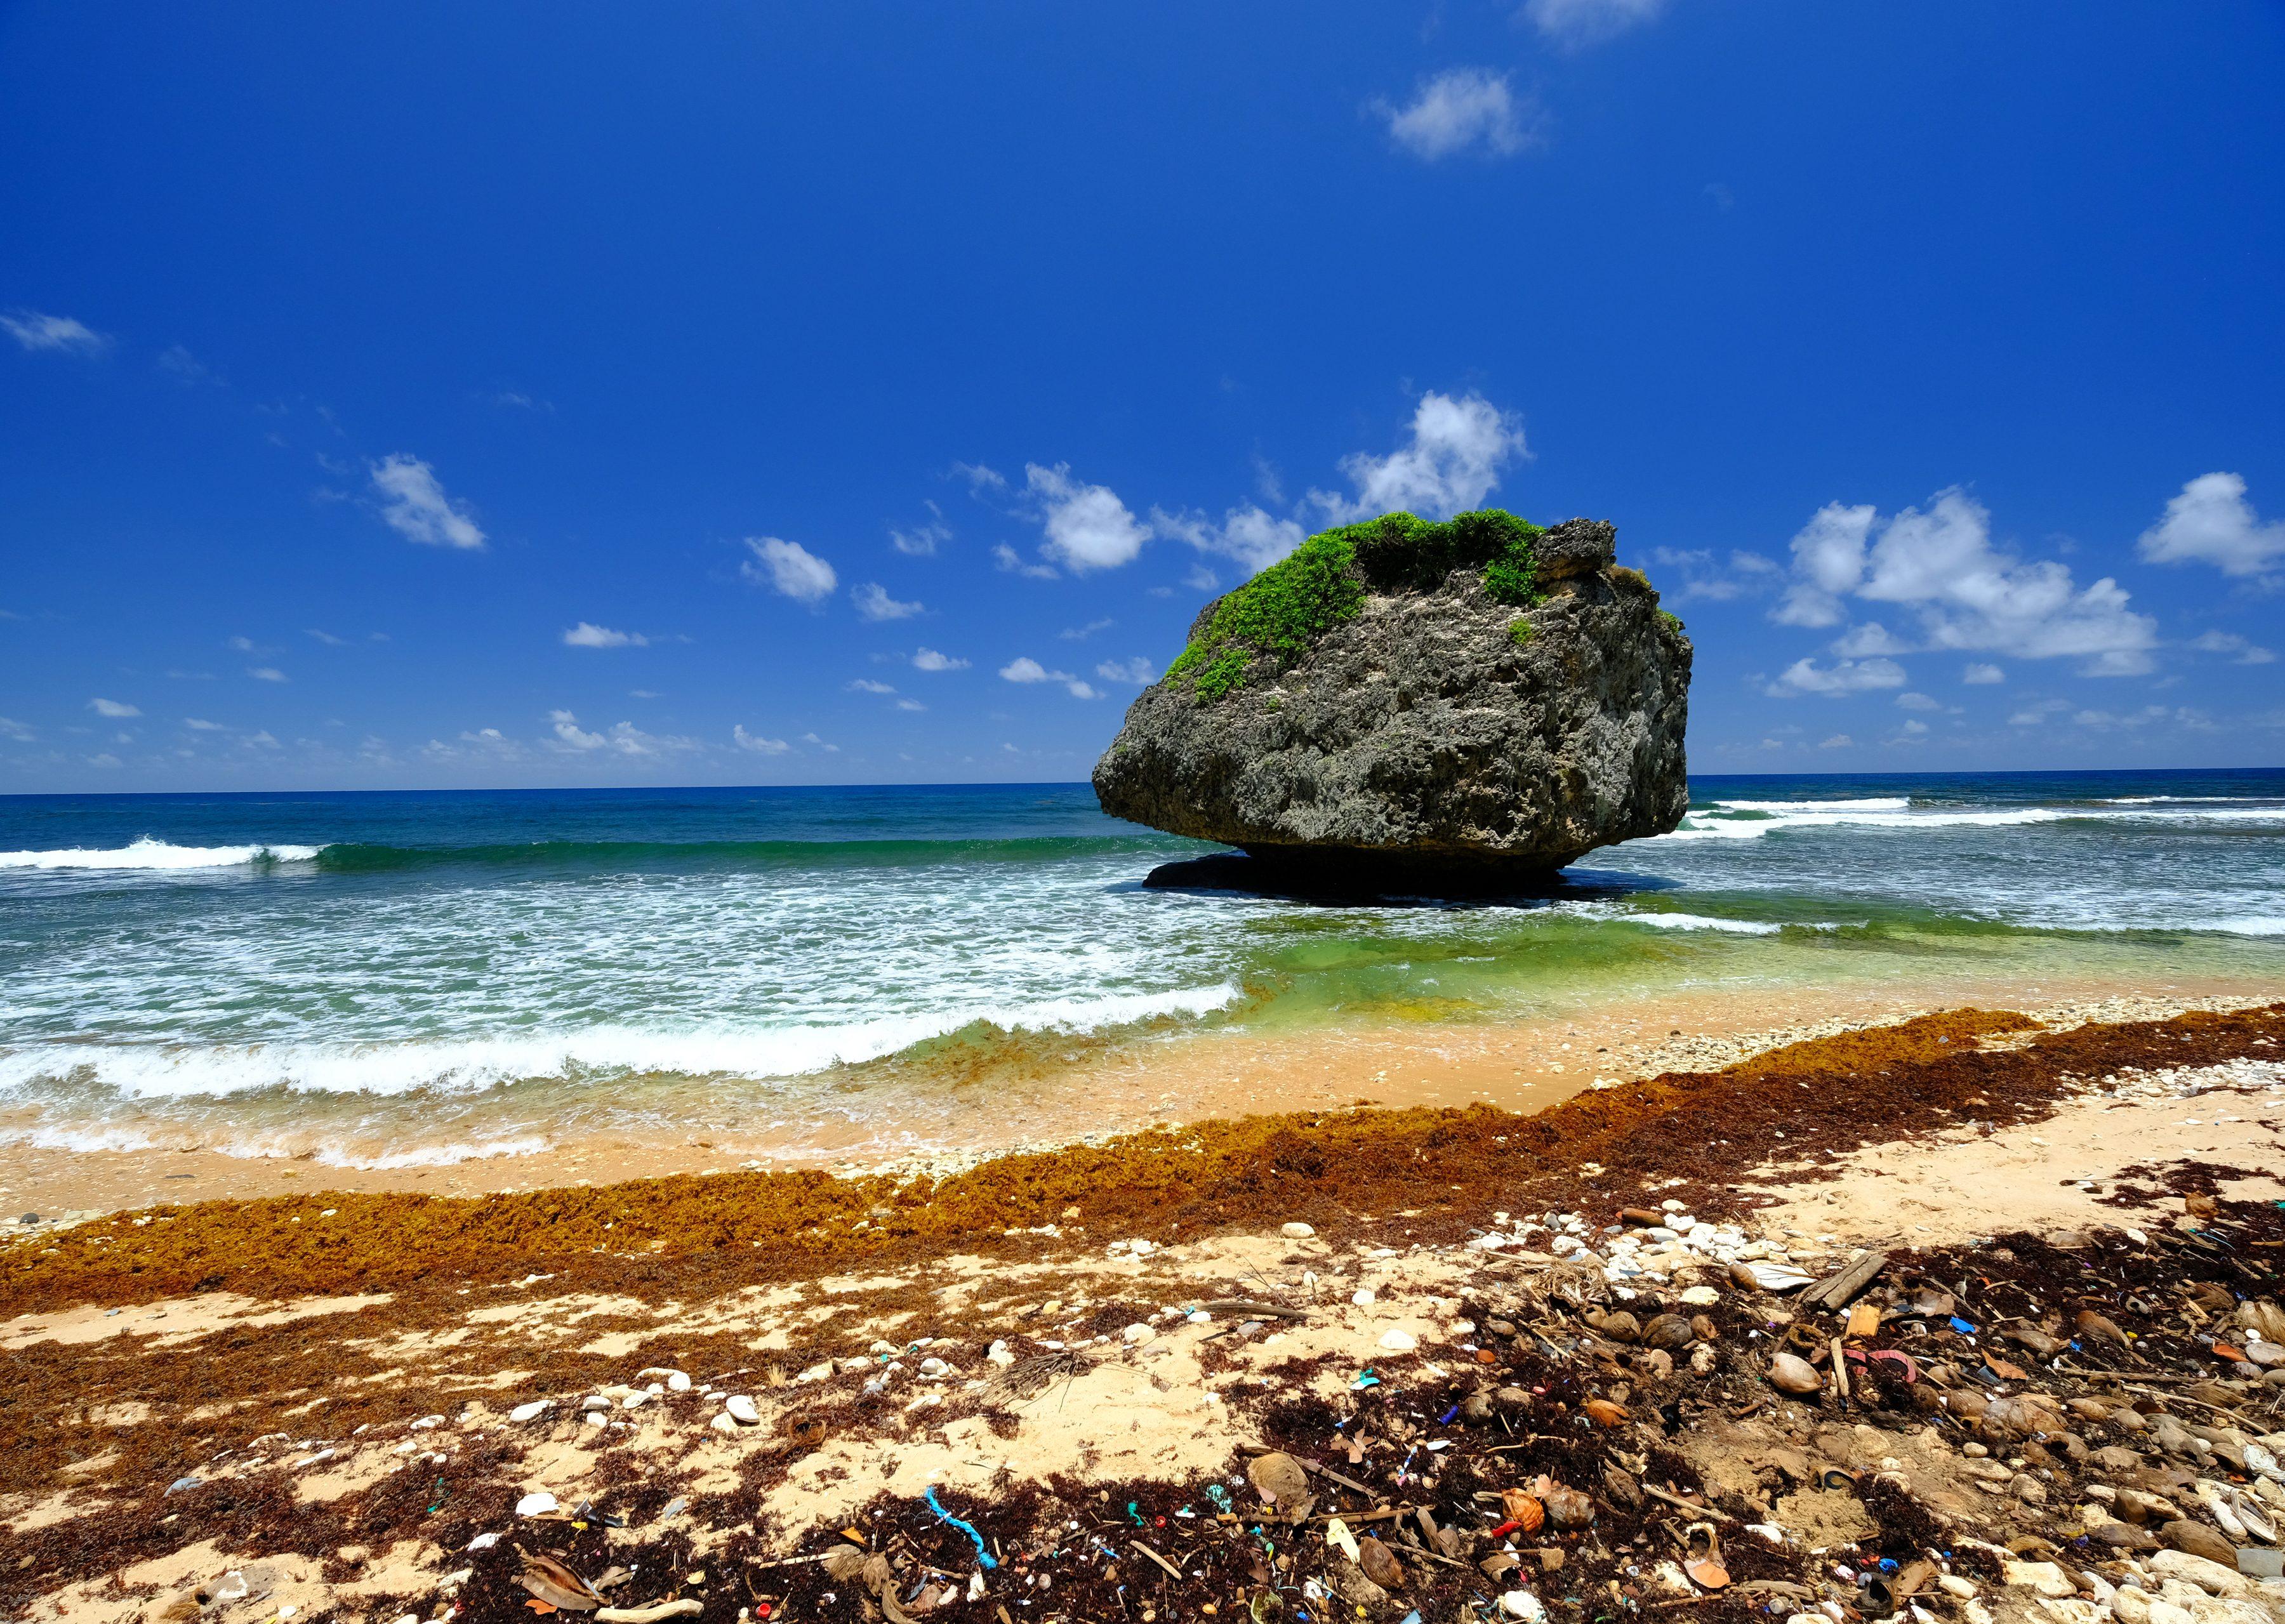 Beautiful Bathsheba Beach in Barbados